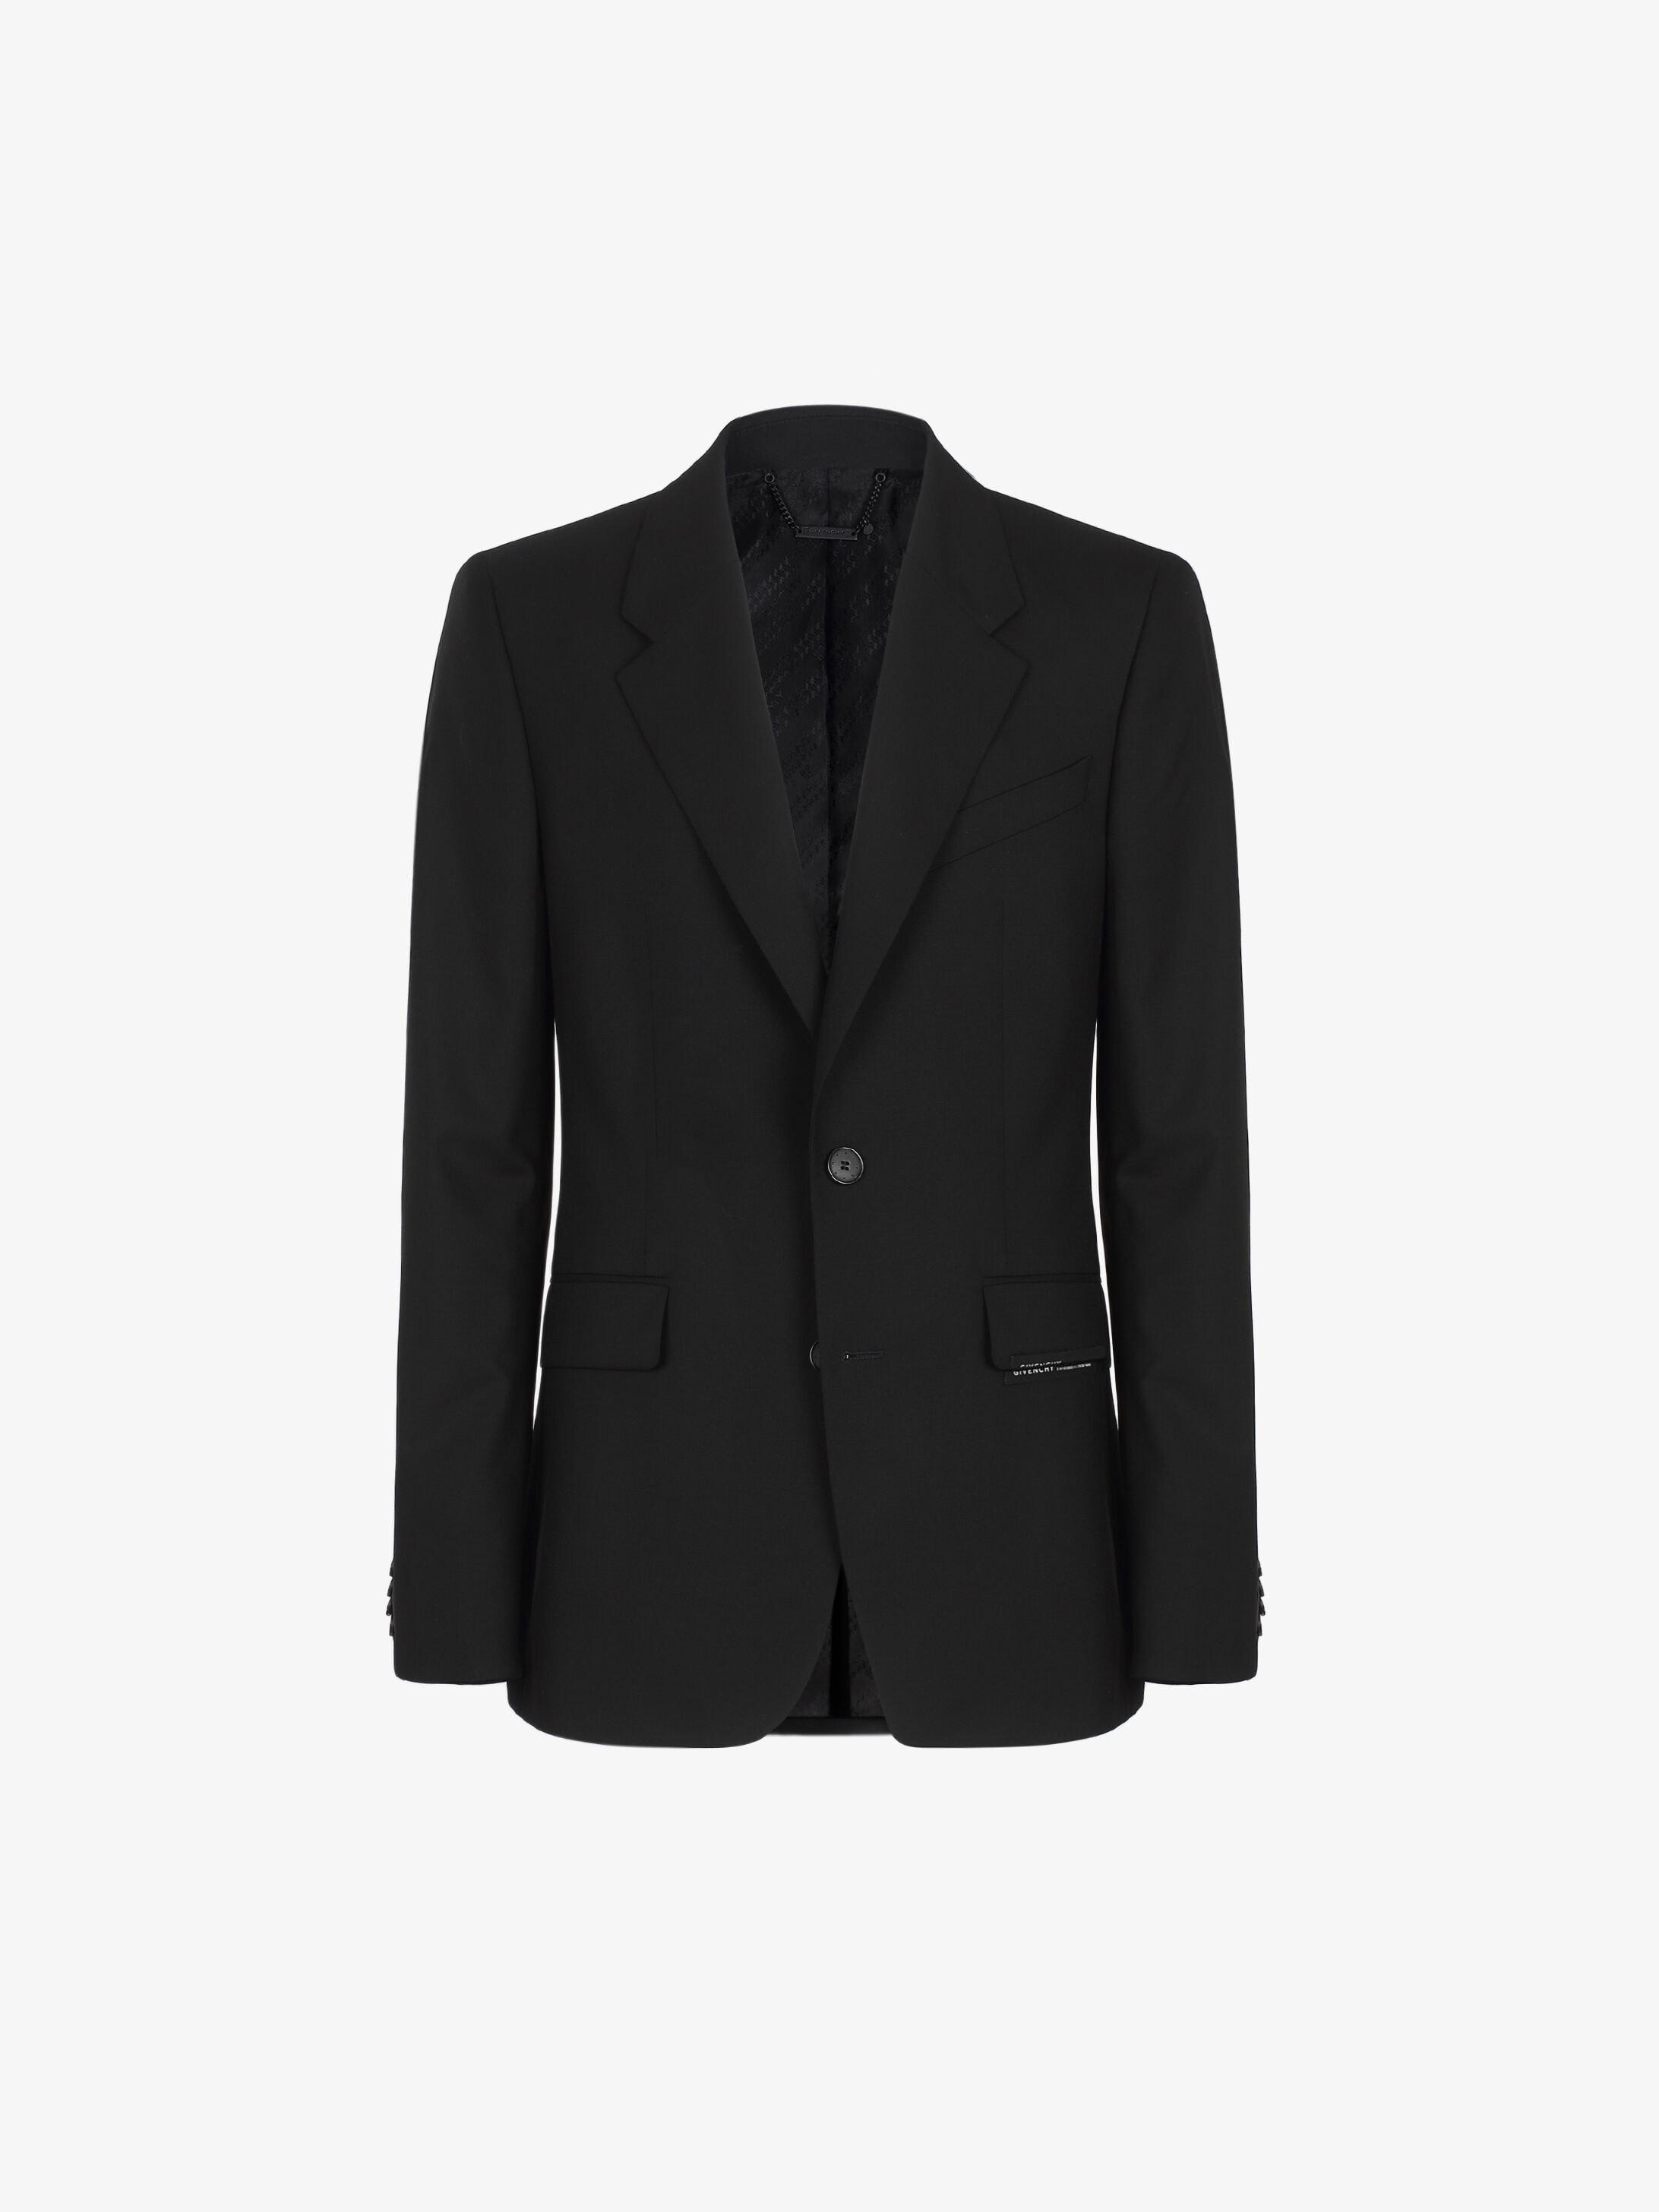 GIVENCHY ADDRESS jacket in embellished super 120's wool